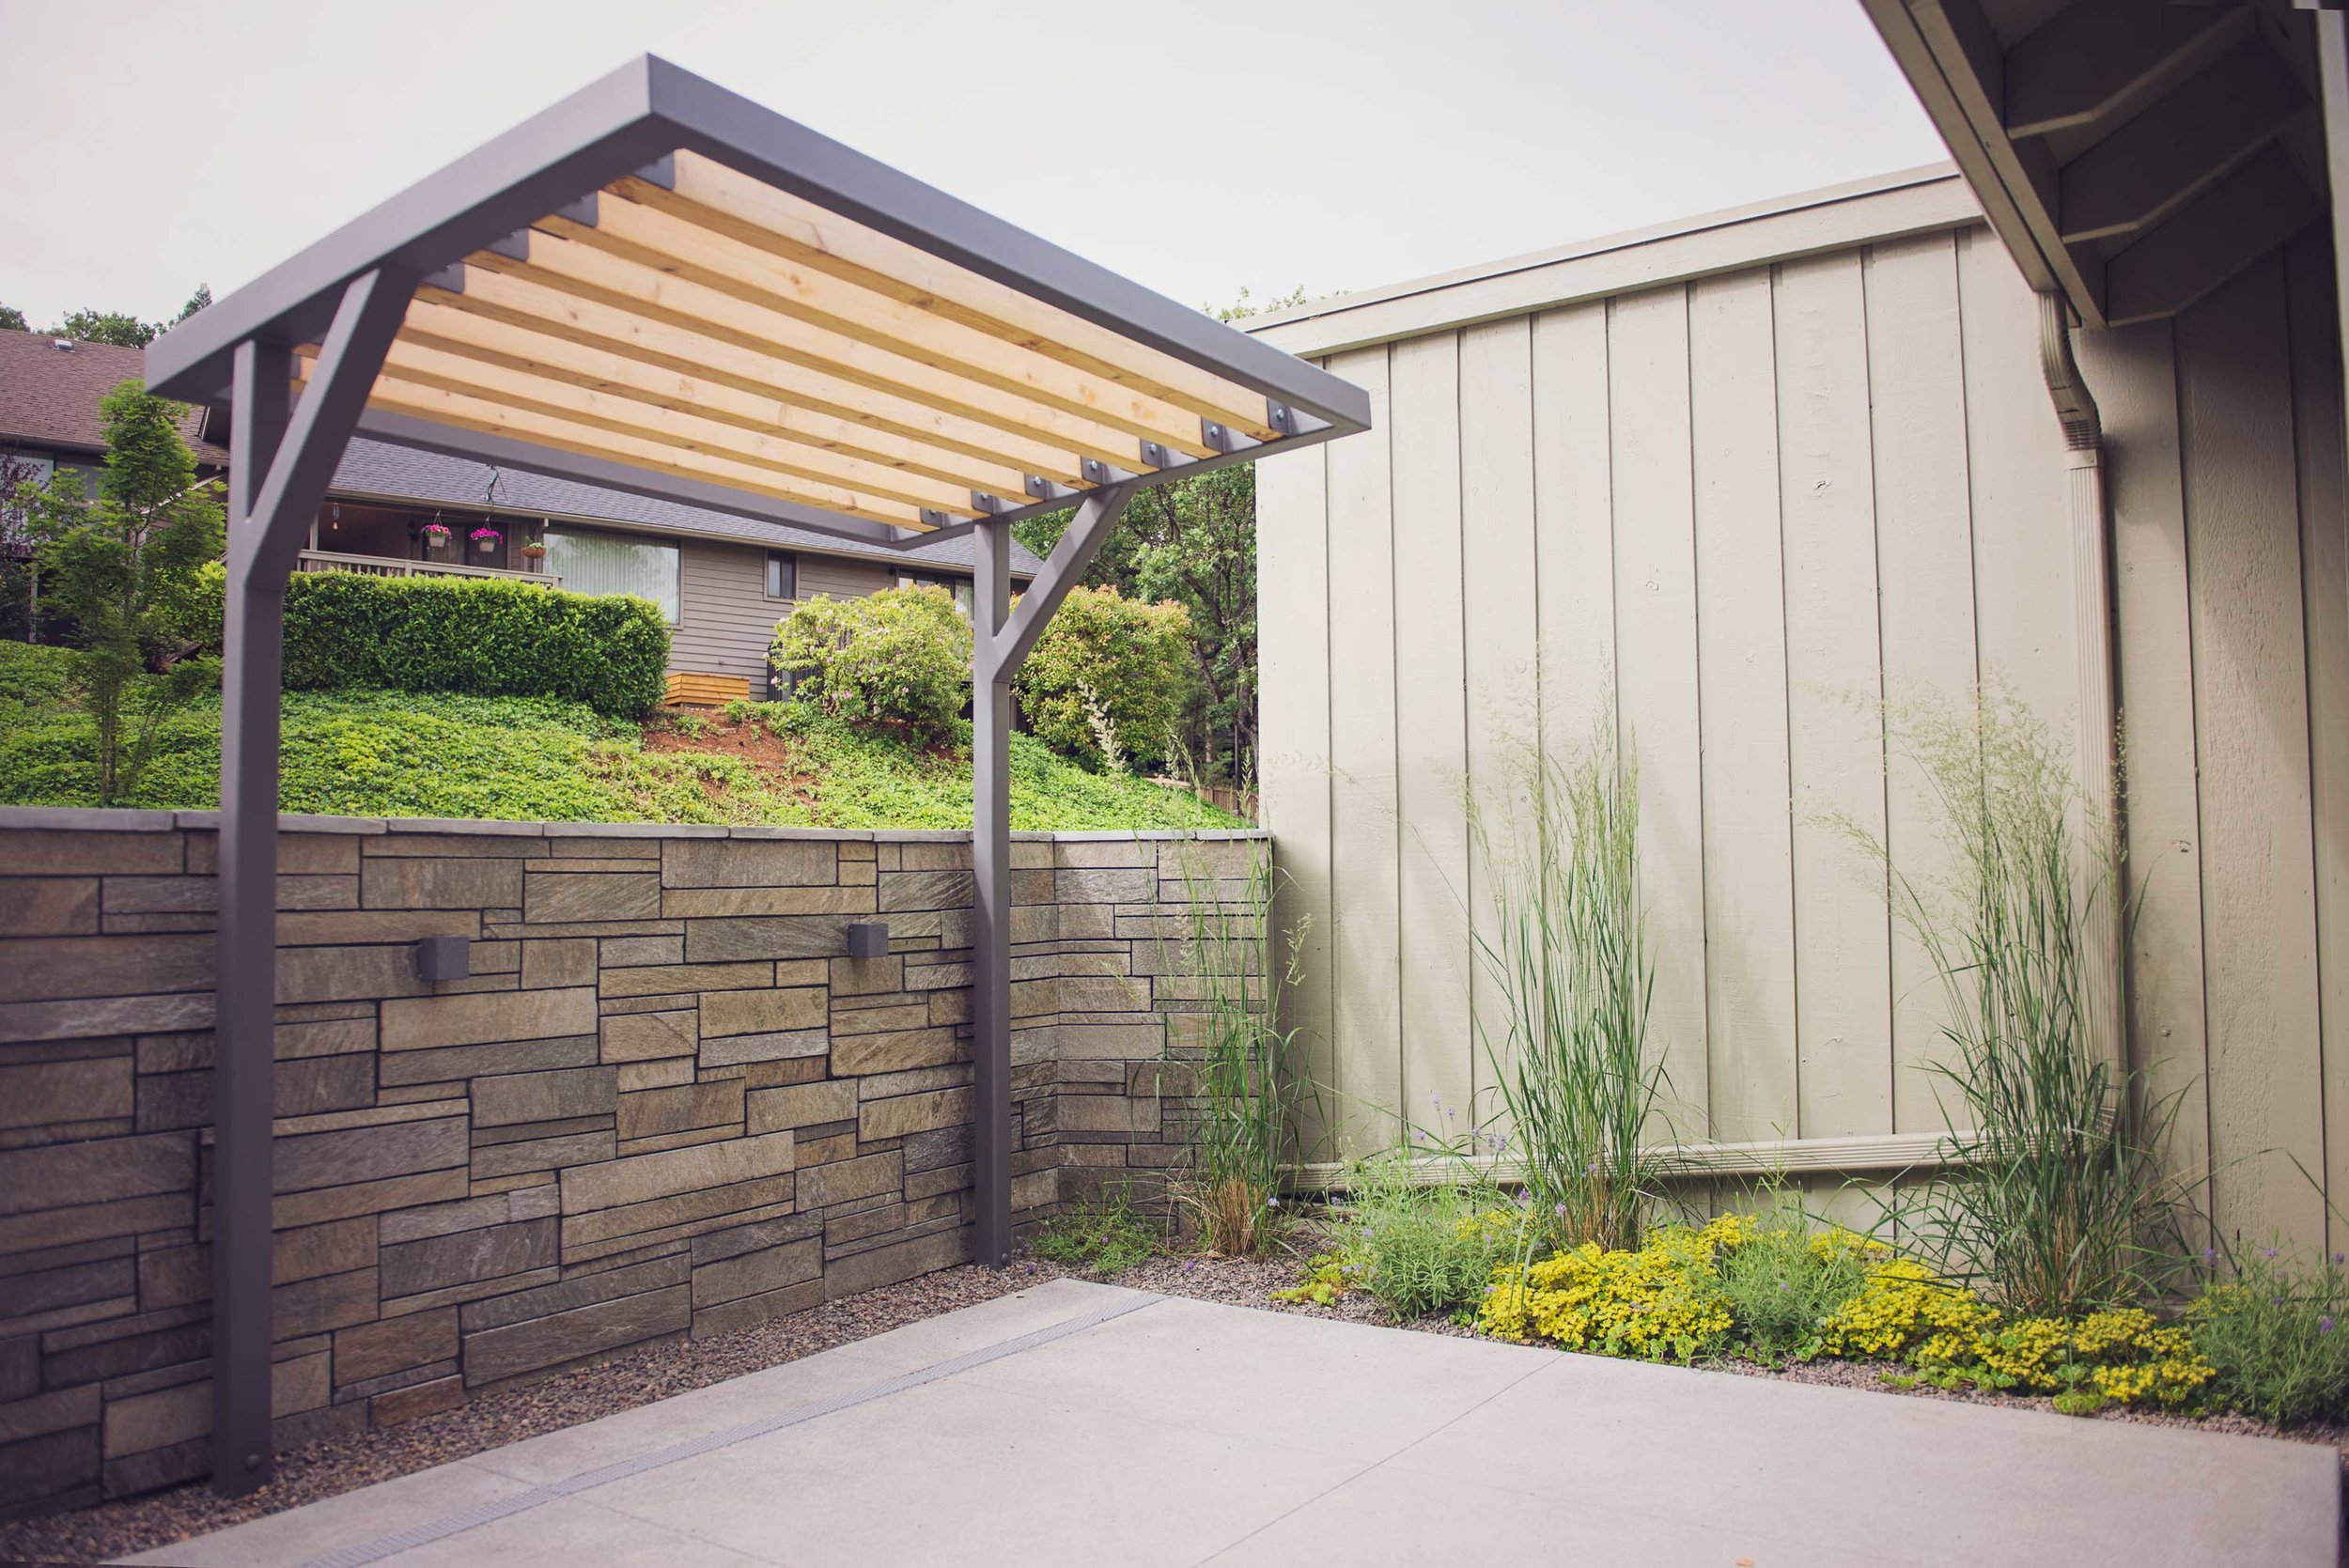 Modern Patio Design with Cedar + Steel Shade Arbor and Low-Maintenance Landscaping.jpg